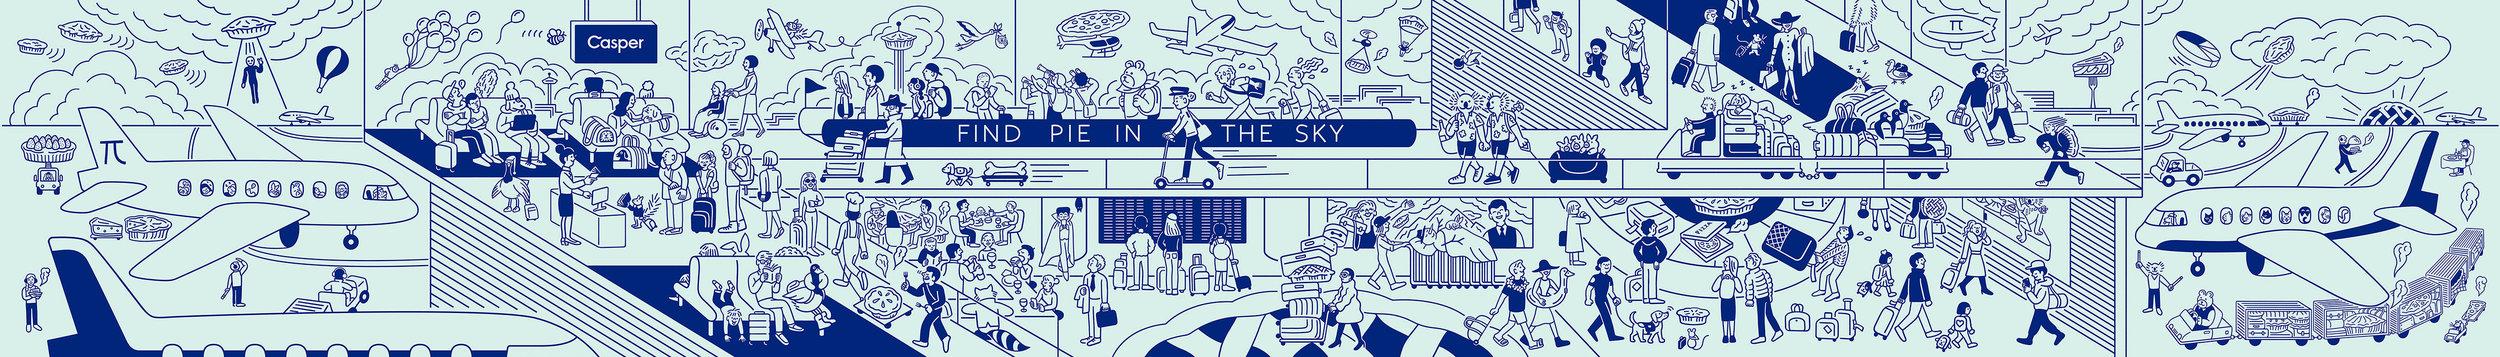 Download Full Size - CASPER - Find pie in the sky